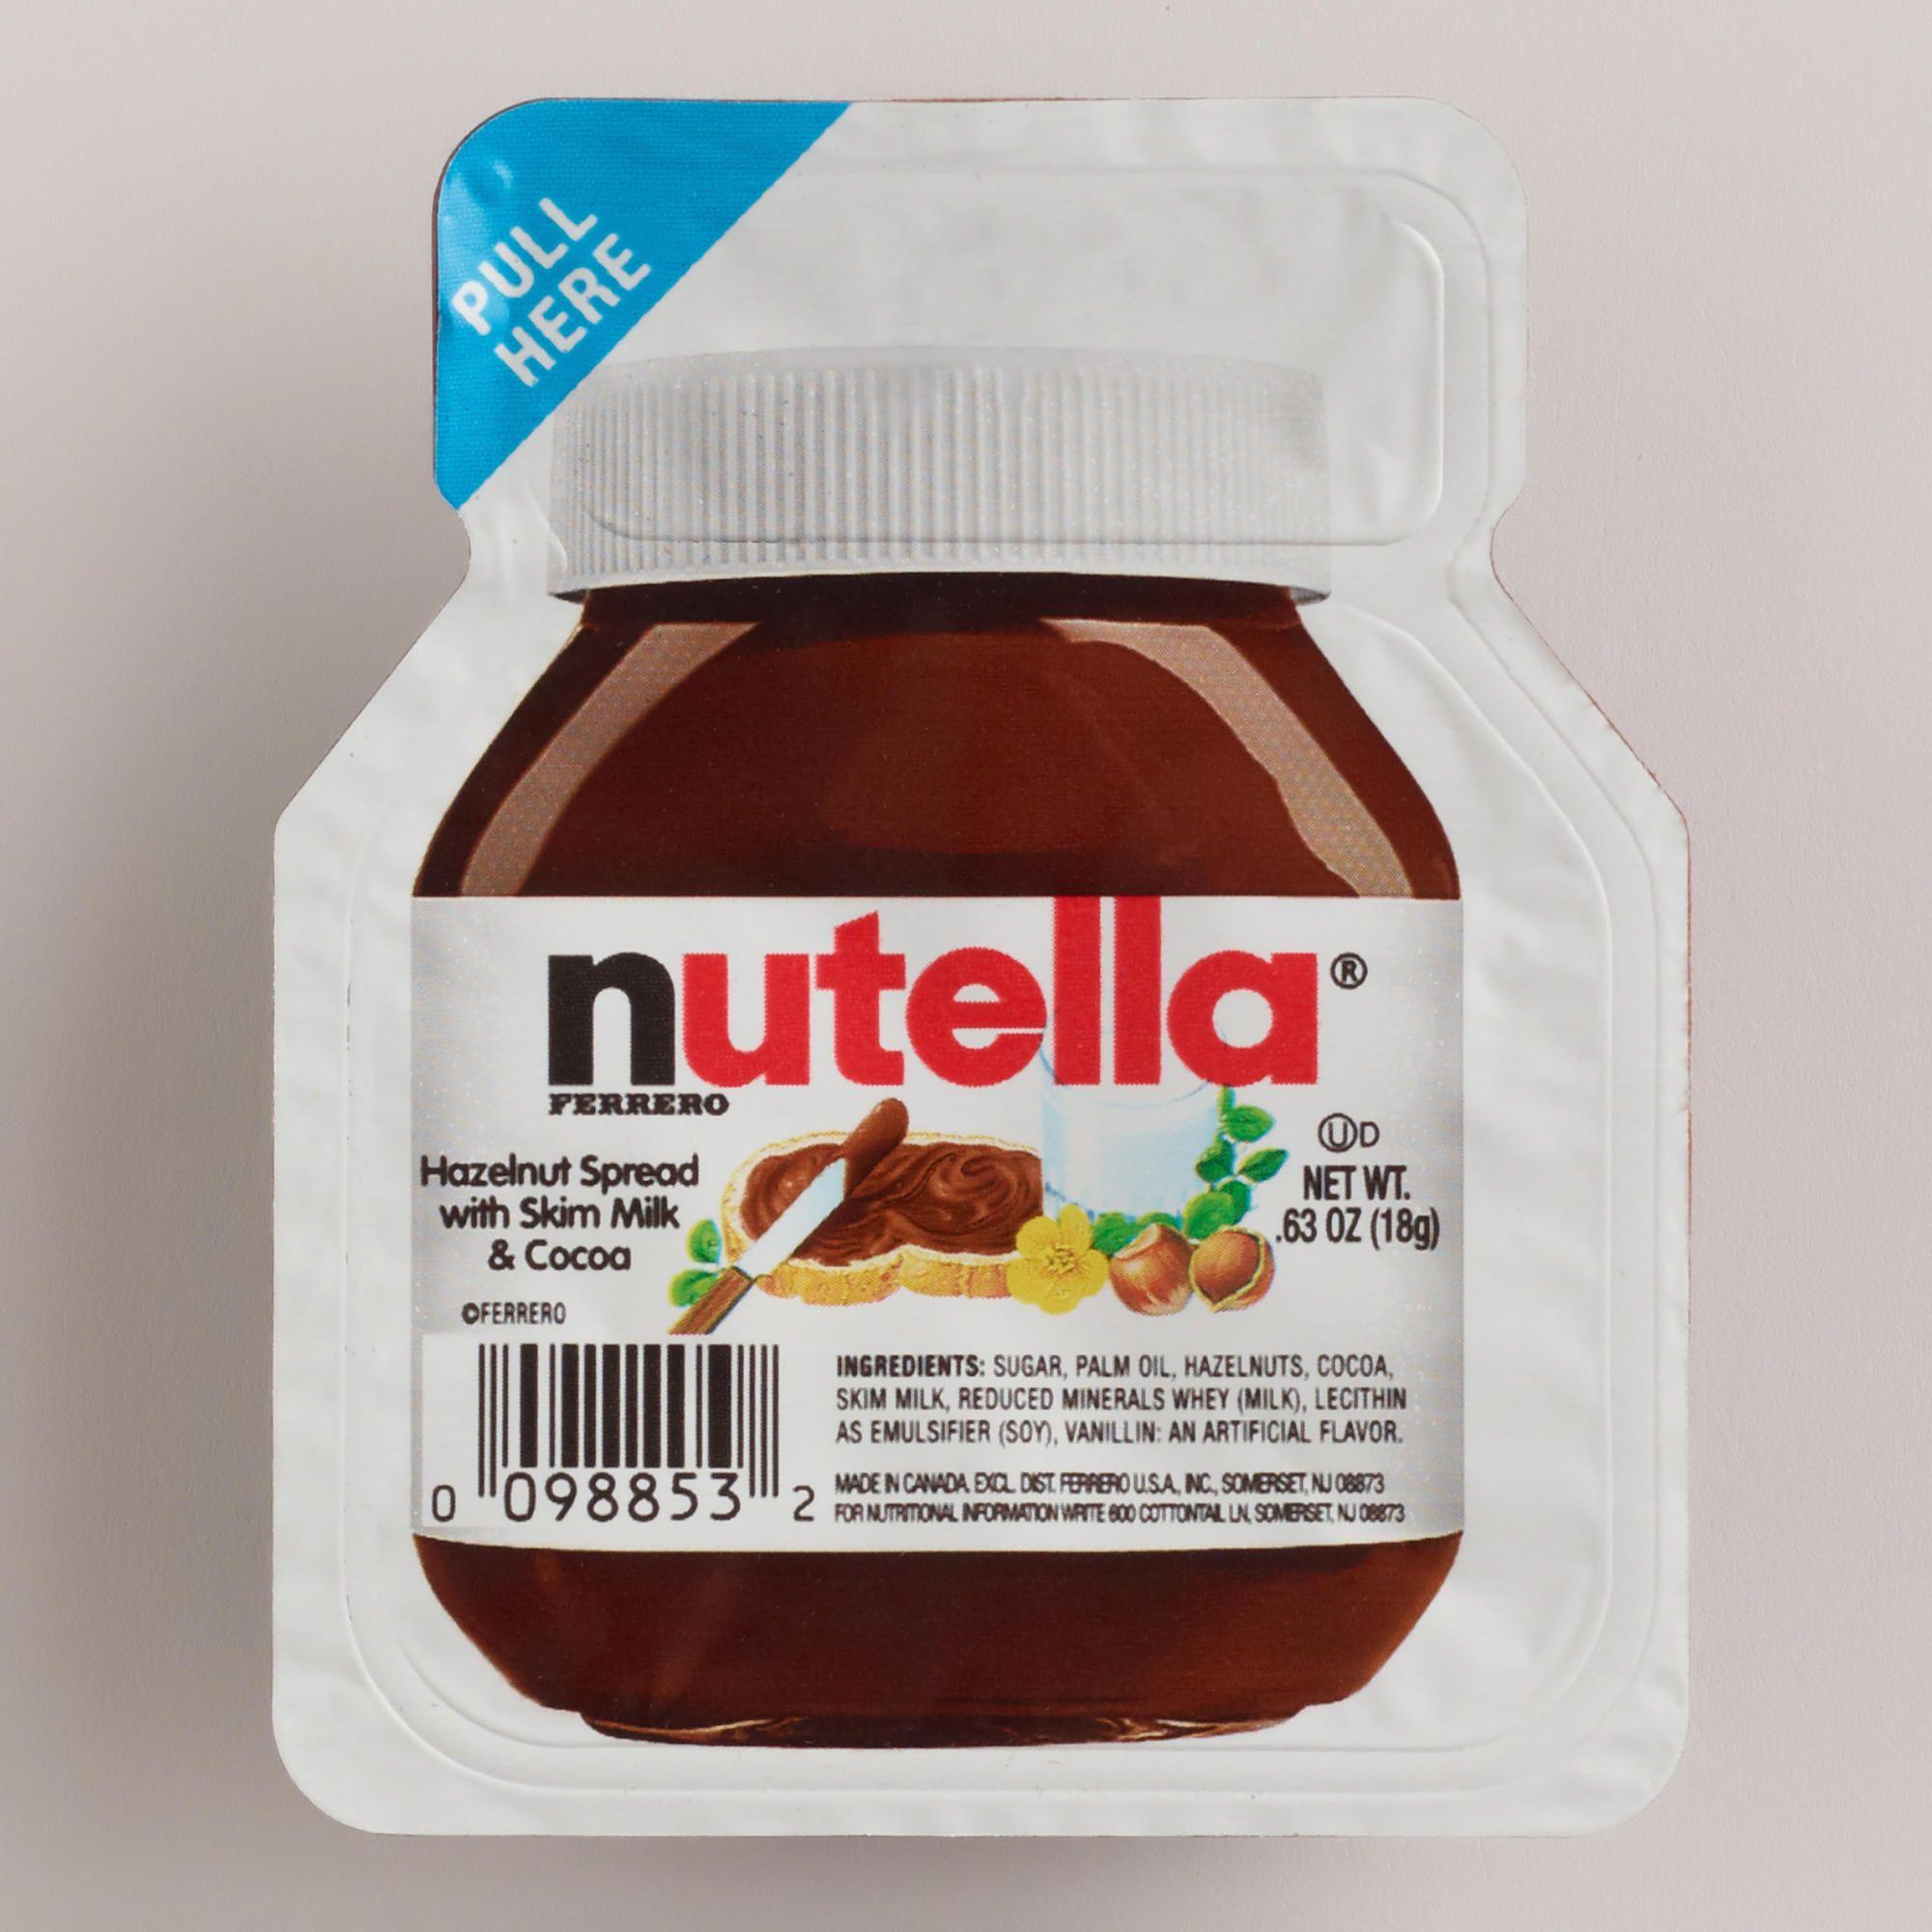 Hotel Welcome Bags: Mini Nutella Hazelnut Spread Cup (apple